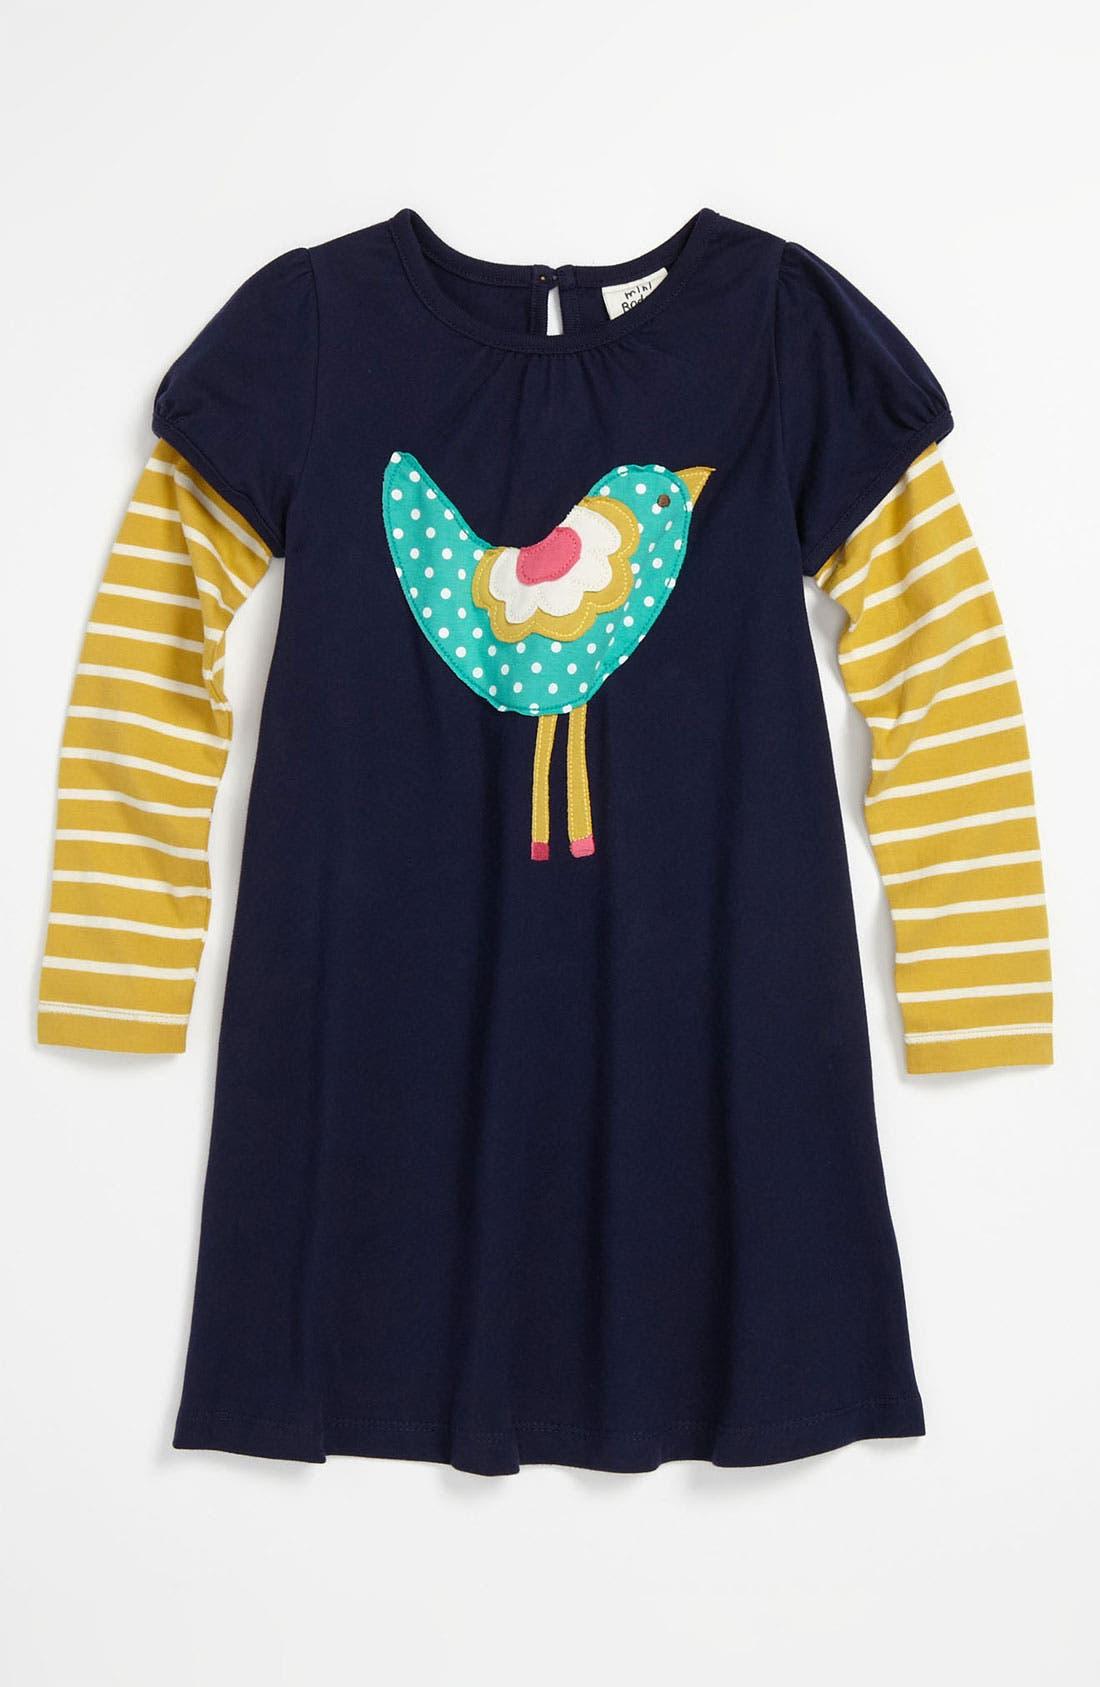 Alternate Image 1 Selected - Mini Boden 'Fun' Logo Dress (Toddler, Little Girls & Big Girls)